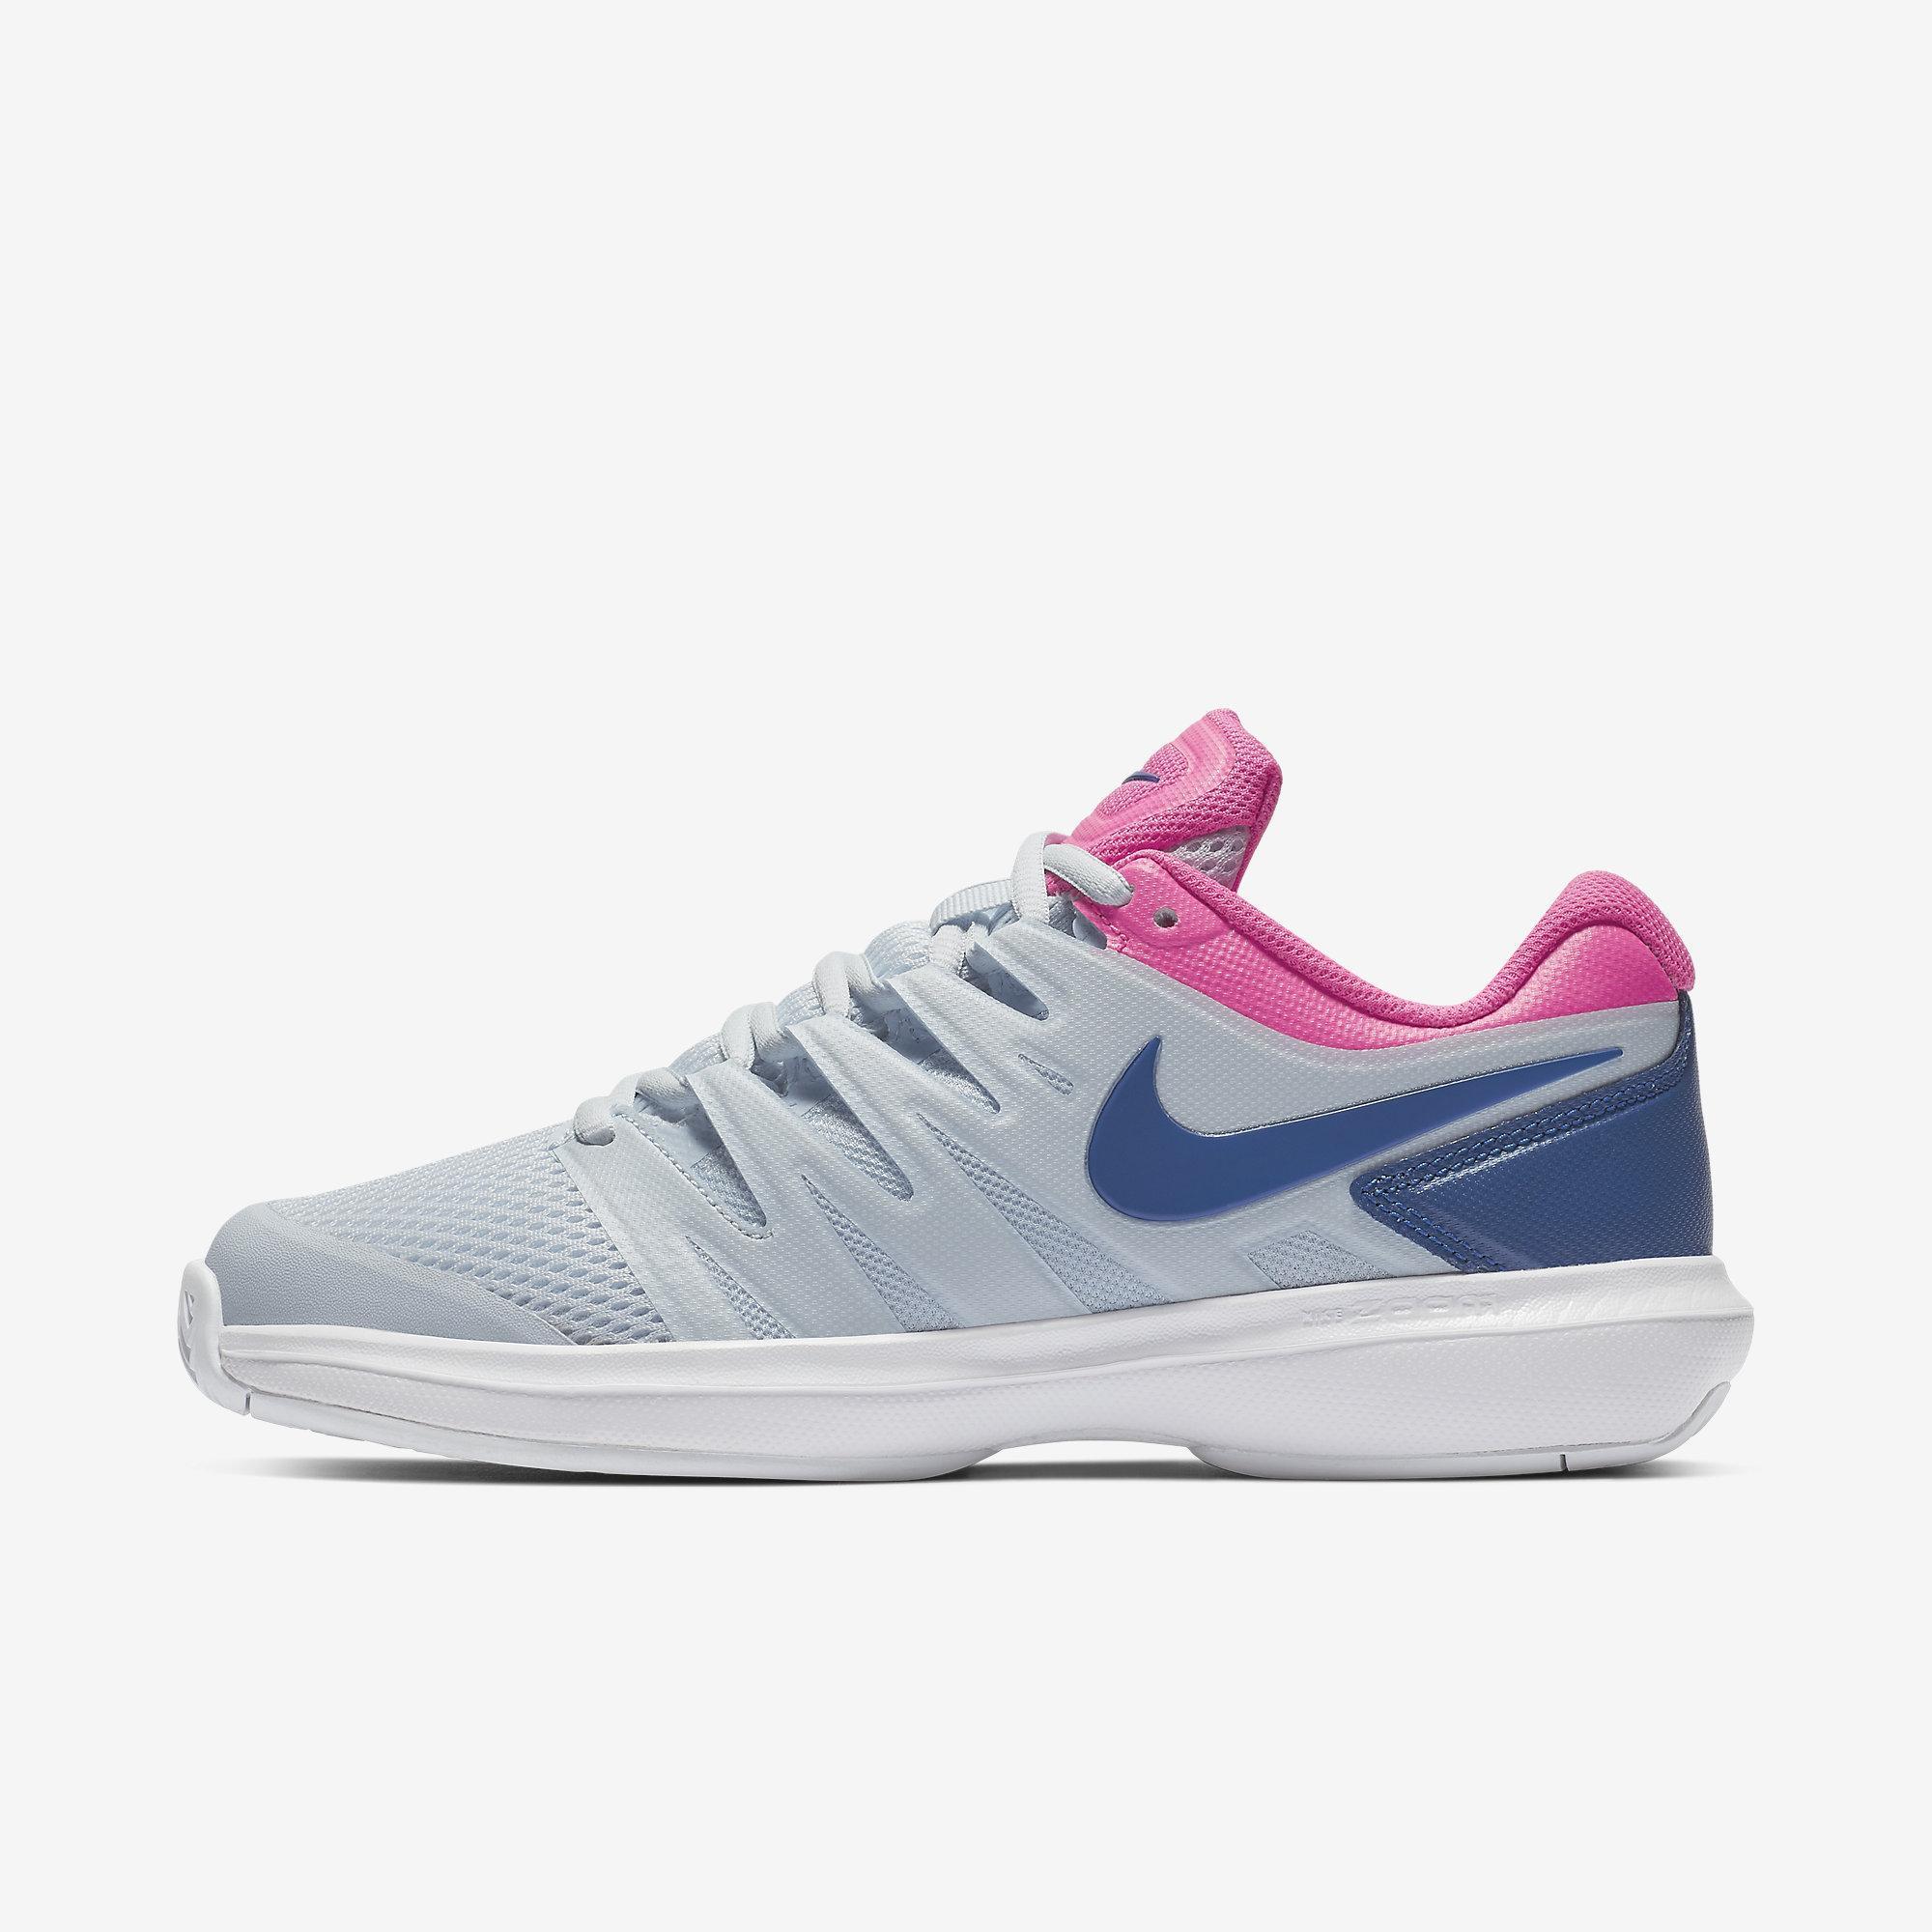 636e1ebe6d037 Nike Womens Air Zoom Prestige Tennis Shoes - Half Blue/Pink Blast -  Tennisnuts.com